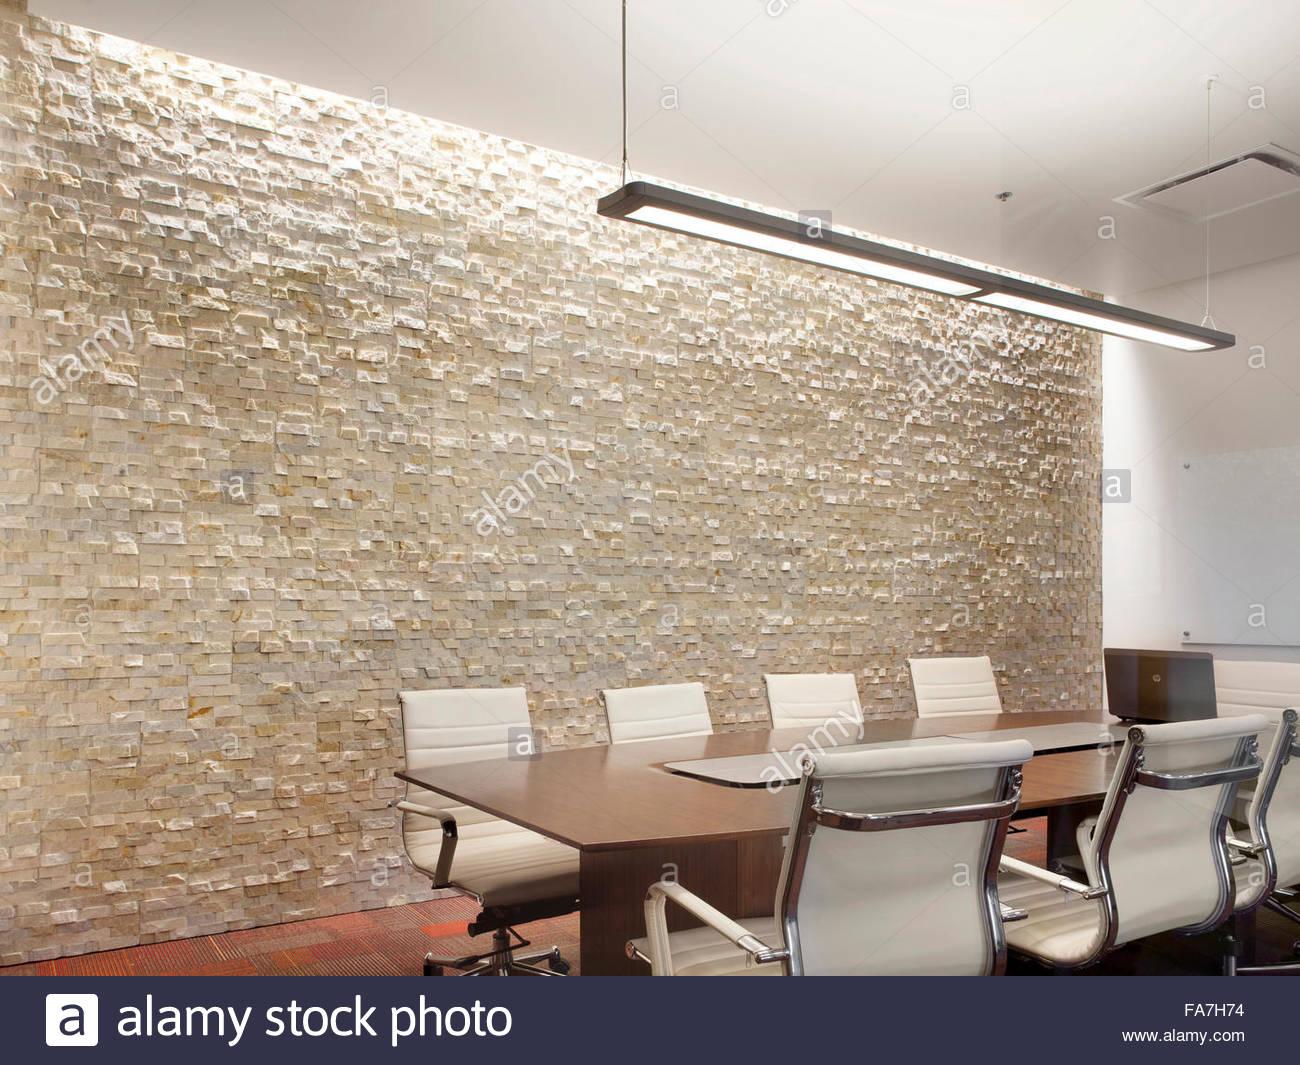 pinnacle architectural lighting stock photos pinnacle